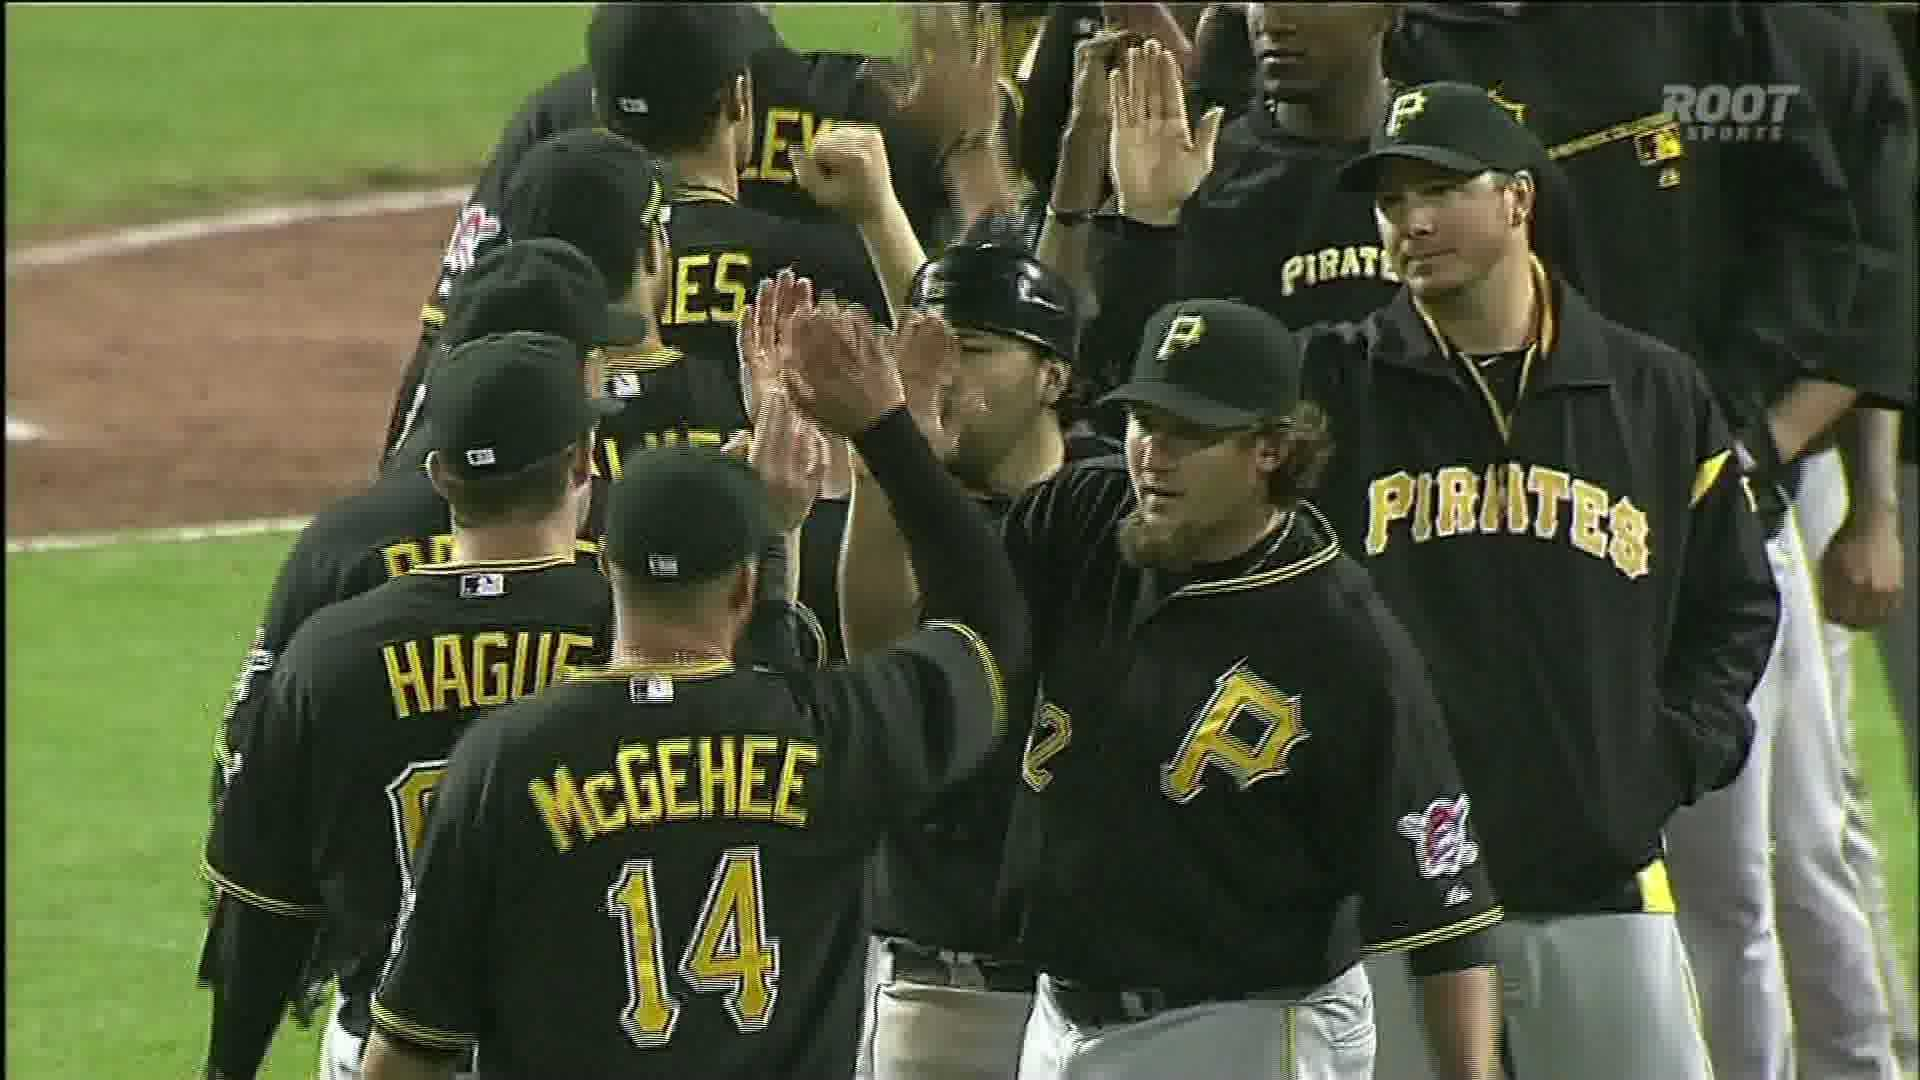 Pirates postgame handshakes